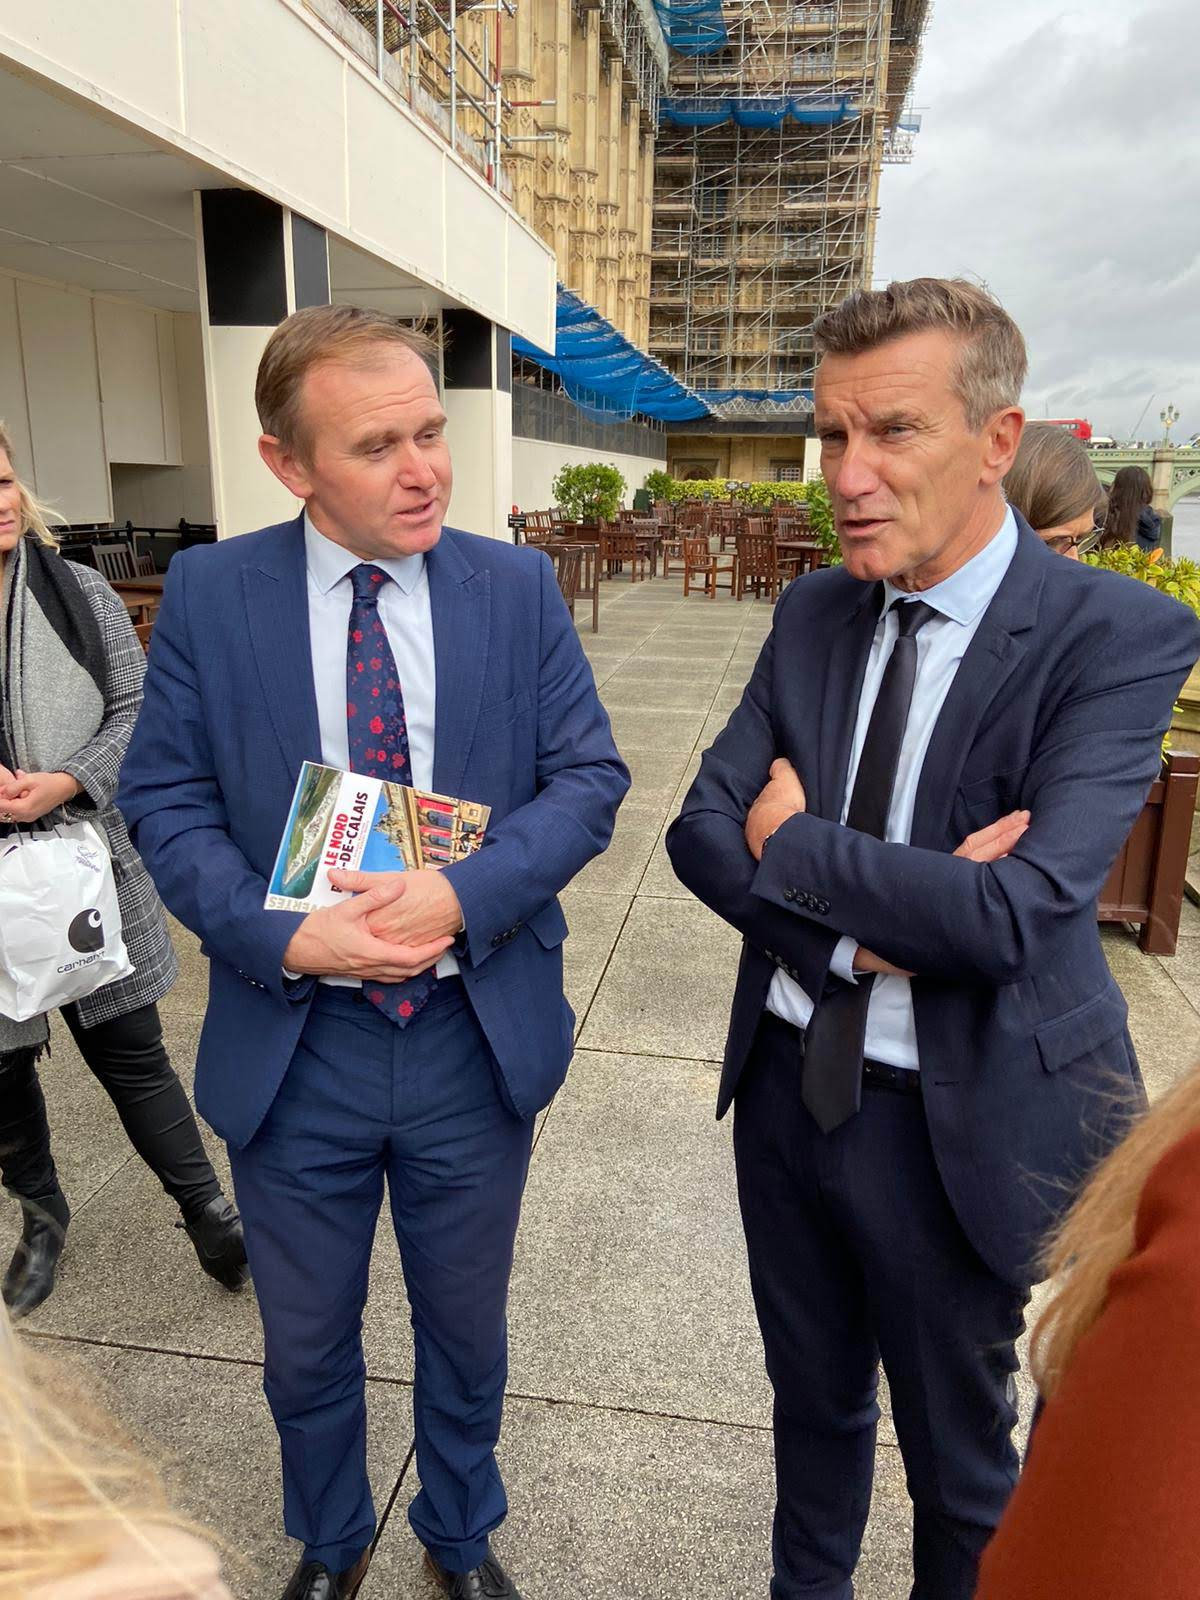 Camborne MP George Eustice with Estaires Mayor Bruno Ficheux